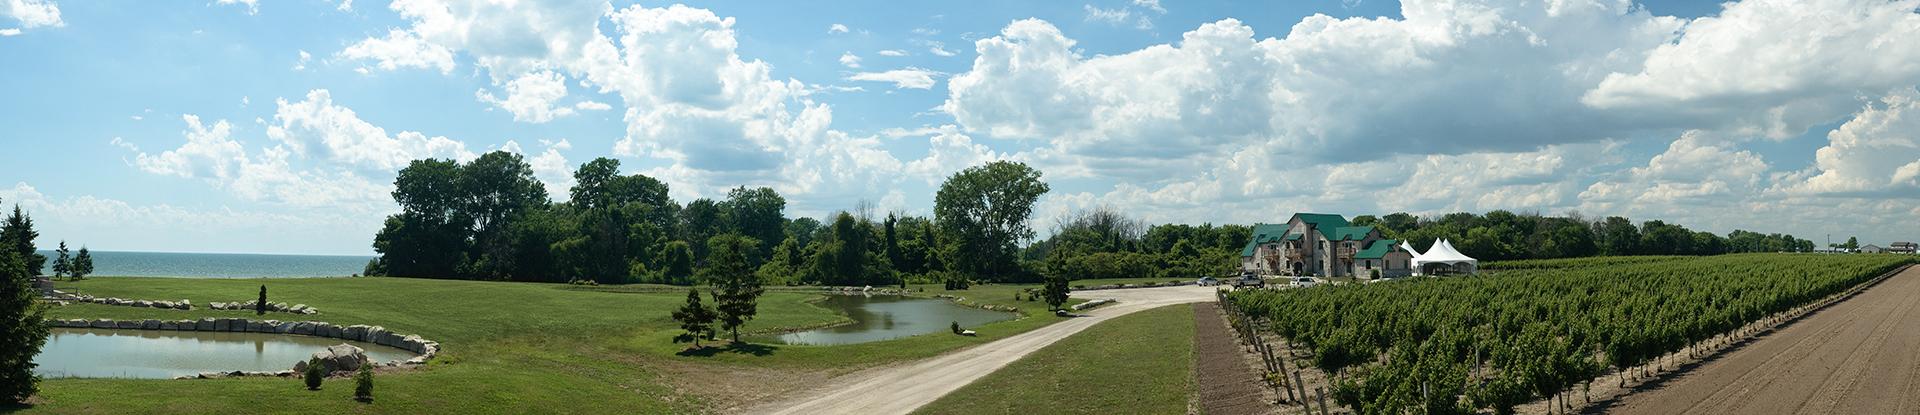 Lake-Pond-Vineyard-Winery_02